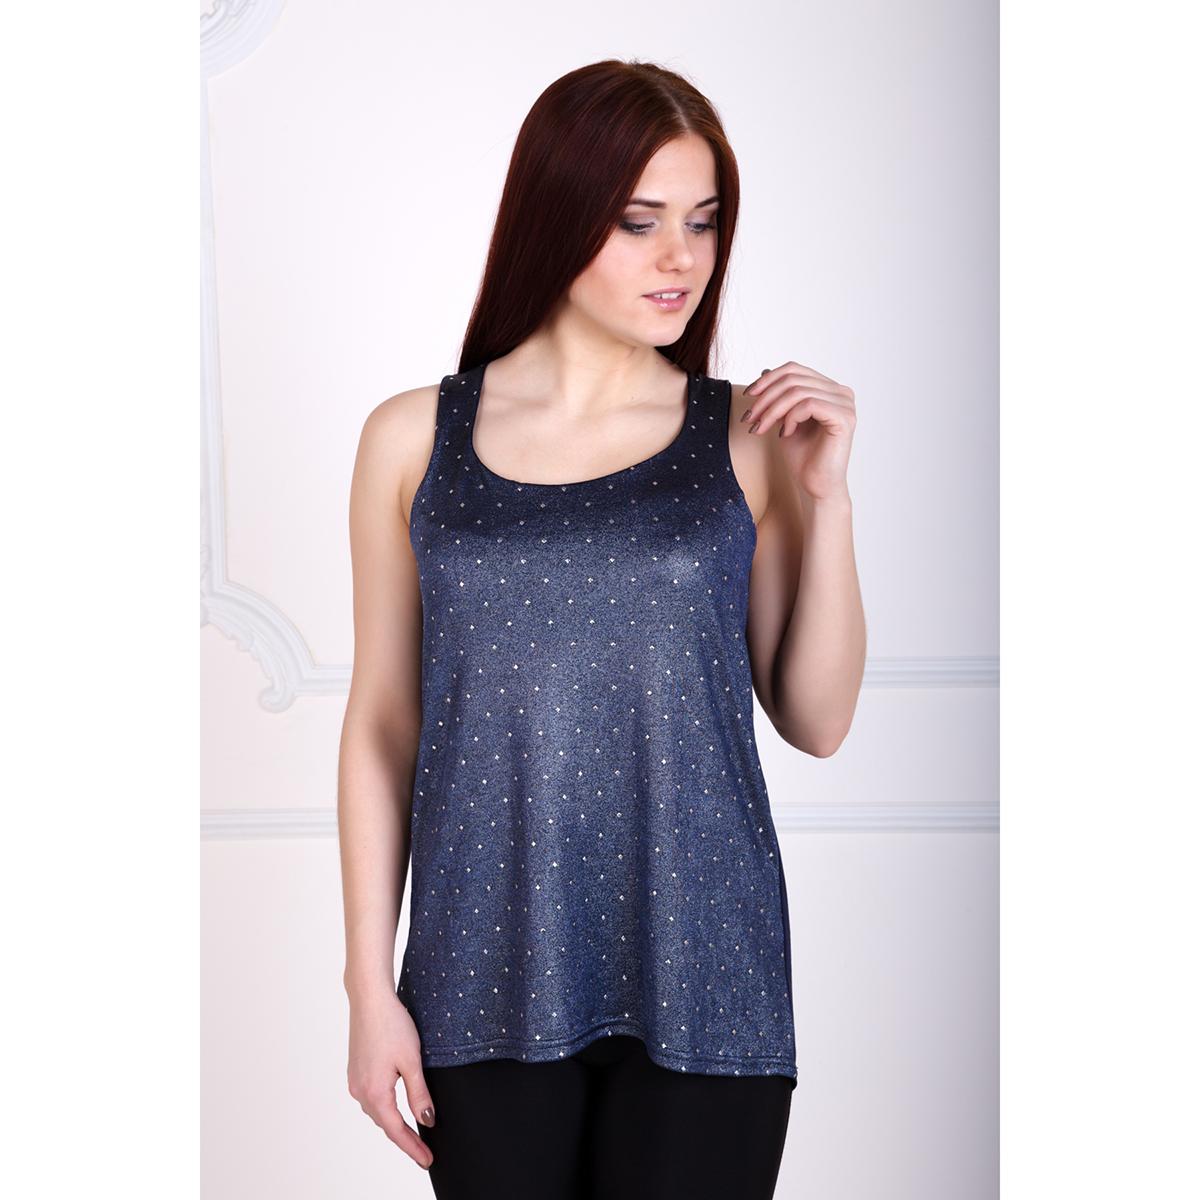 Женская майка Инес Синий, размер 50Майки и футболки<br>Обхват груди: 100 см <br>Обхват талии: 82 см <br>Обхват бедер: 108 см <br>Рост: 167 см<br><br>Тип: Жен. футболка<br>Размер: 50<br>Материал: Вискоза